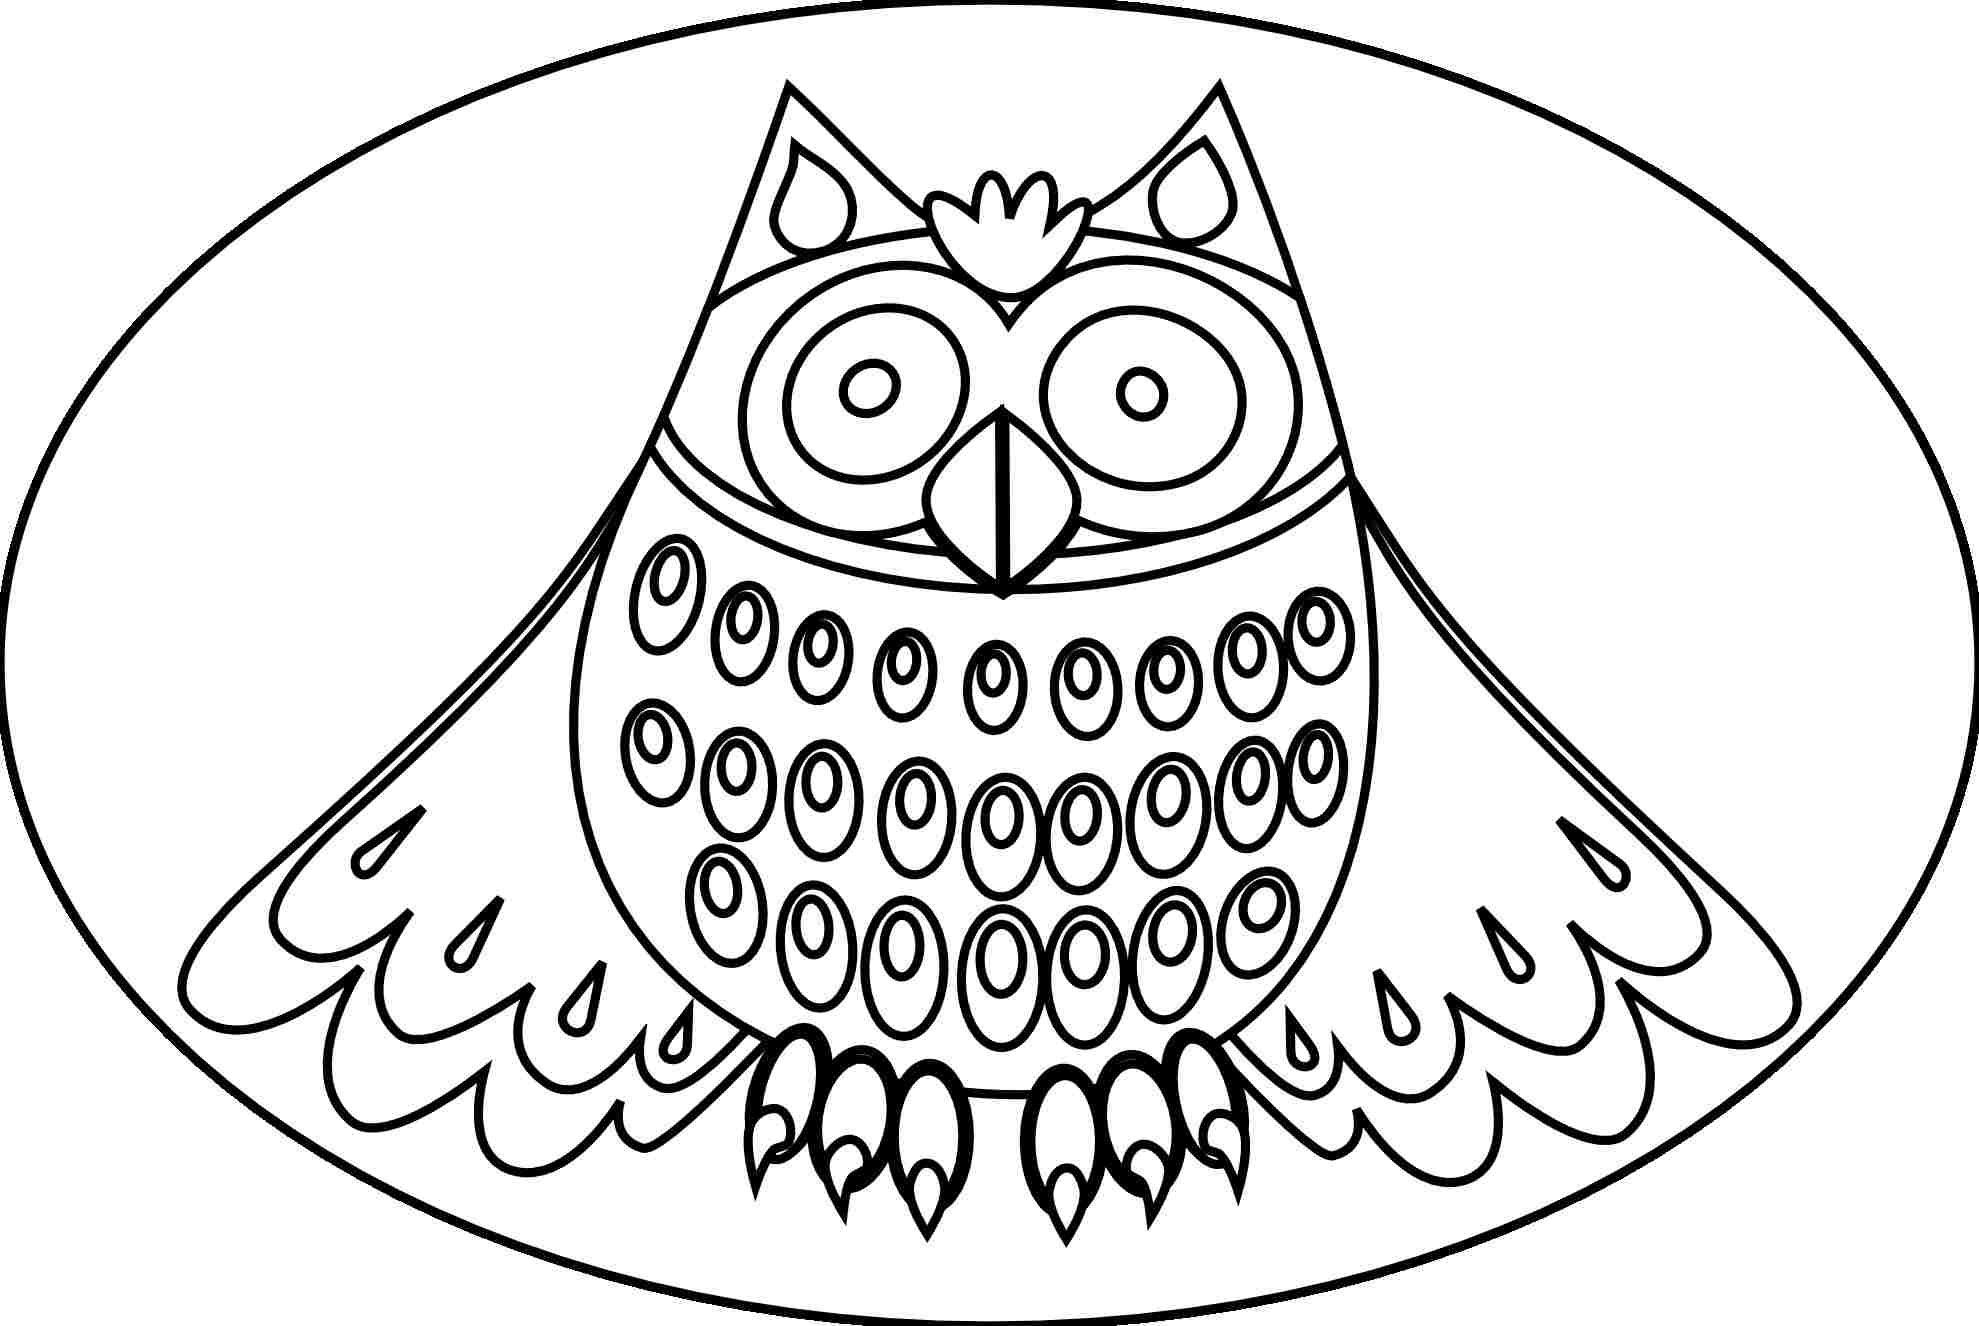 animal-owl-coloring-pages-printable-for-preschool-free-printable ...